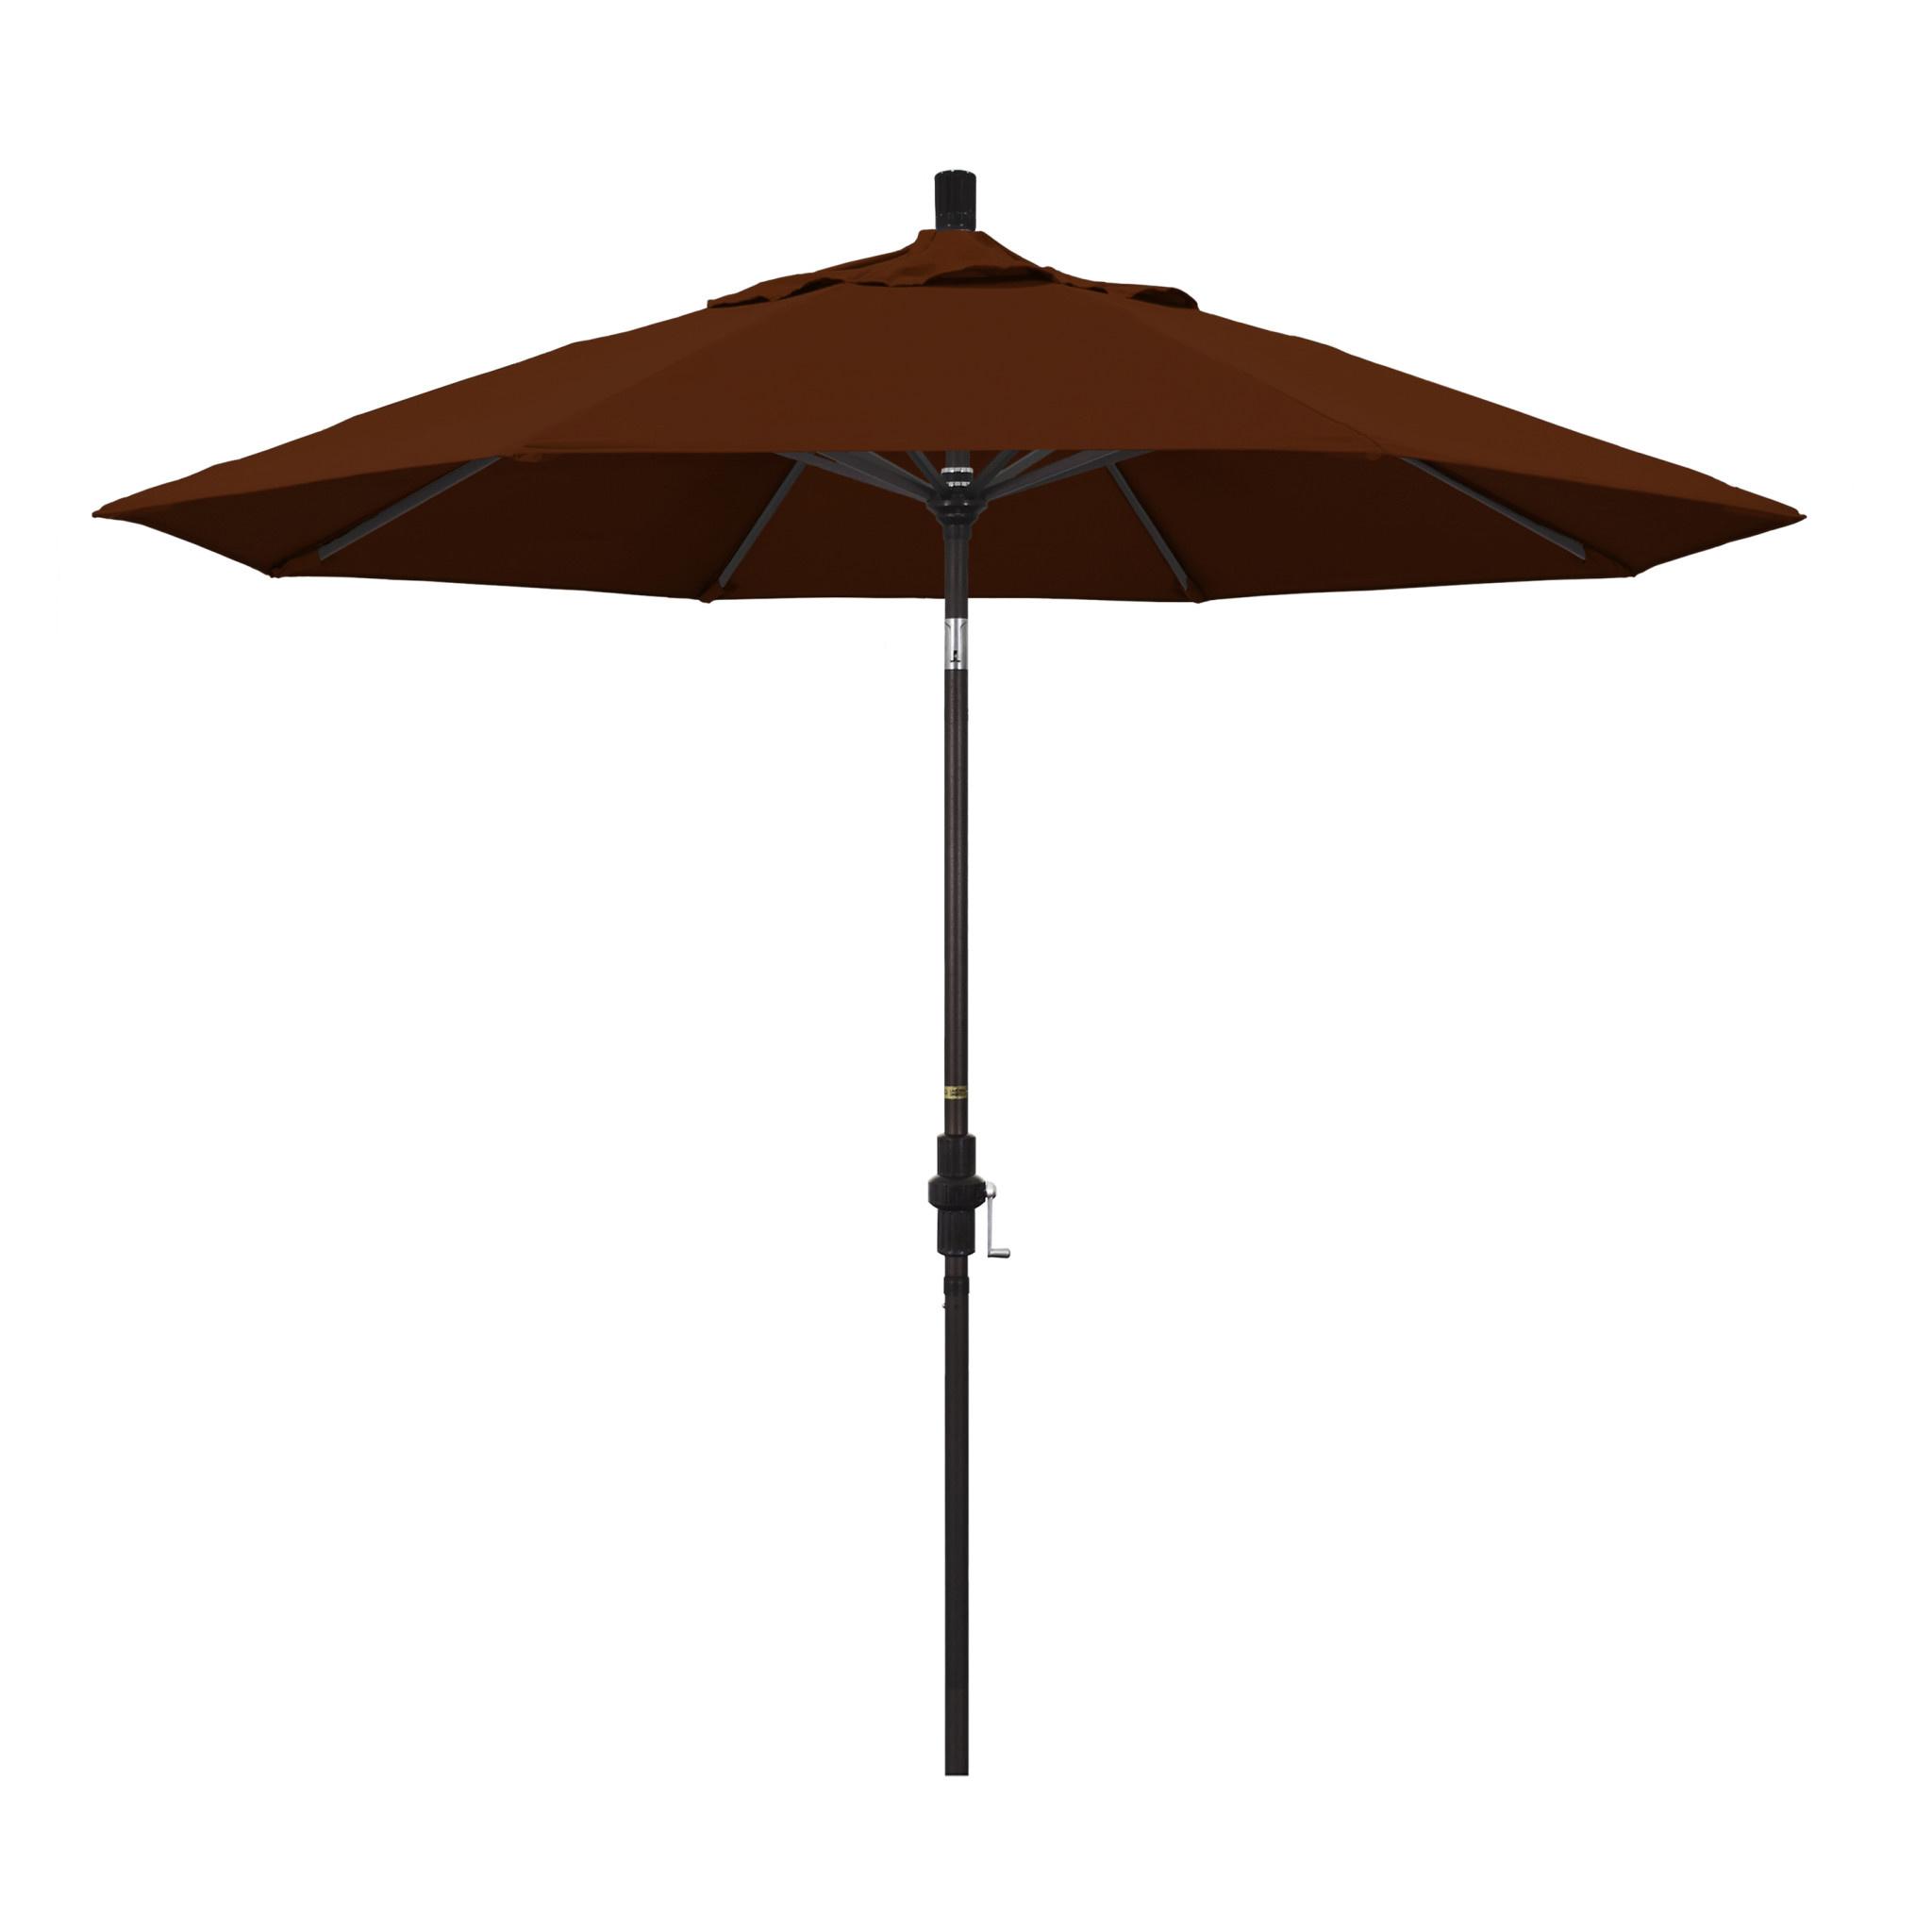 California Umbrella 9' Collar Tilt - Pacifica Terracotta